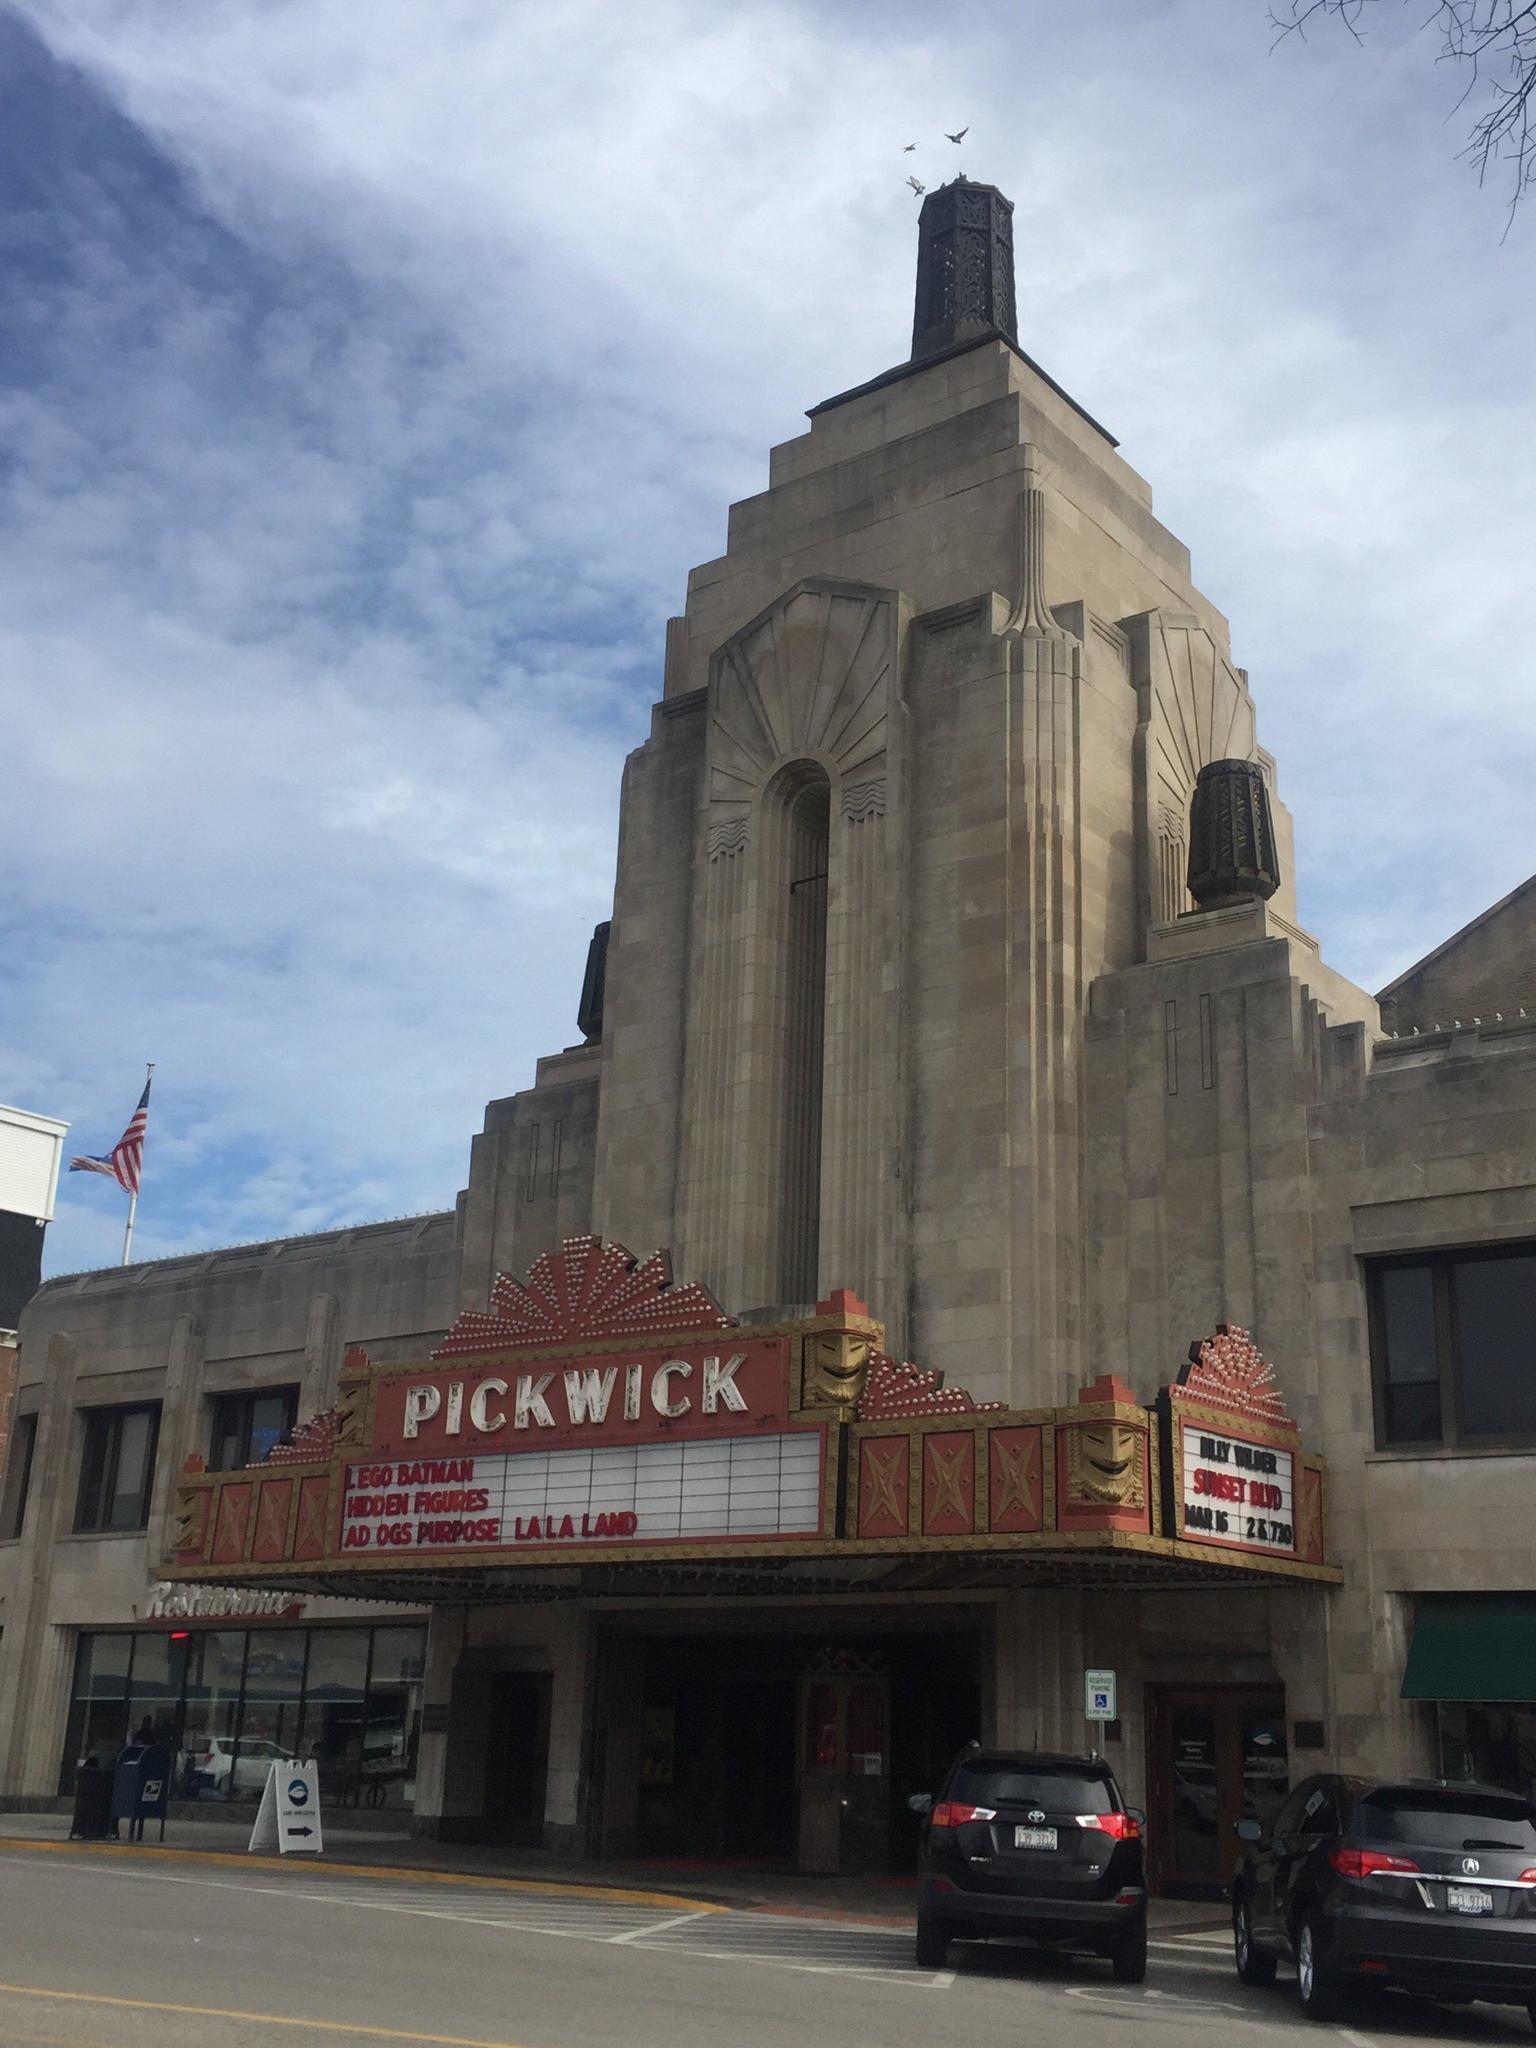 Environmental-themed film festival plans screenings in Park Ridge